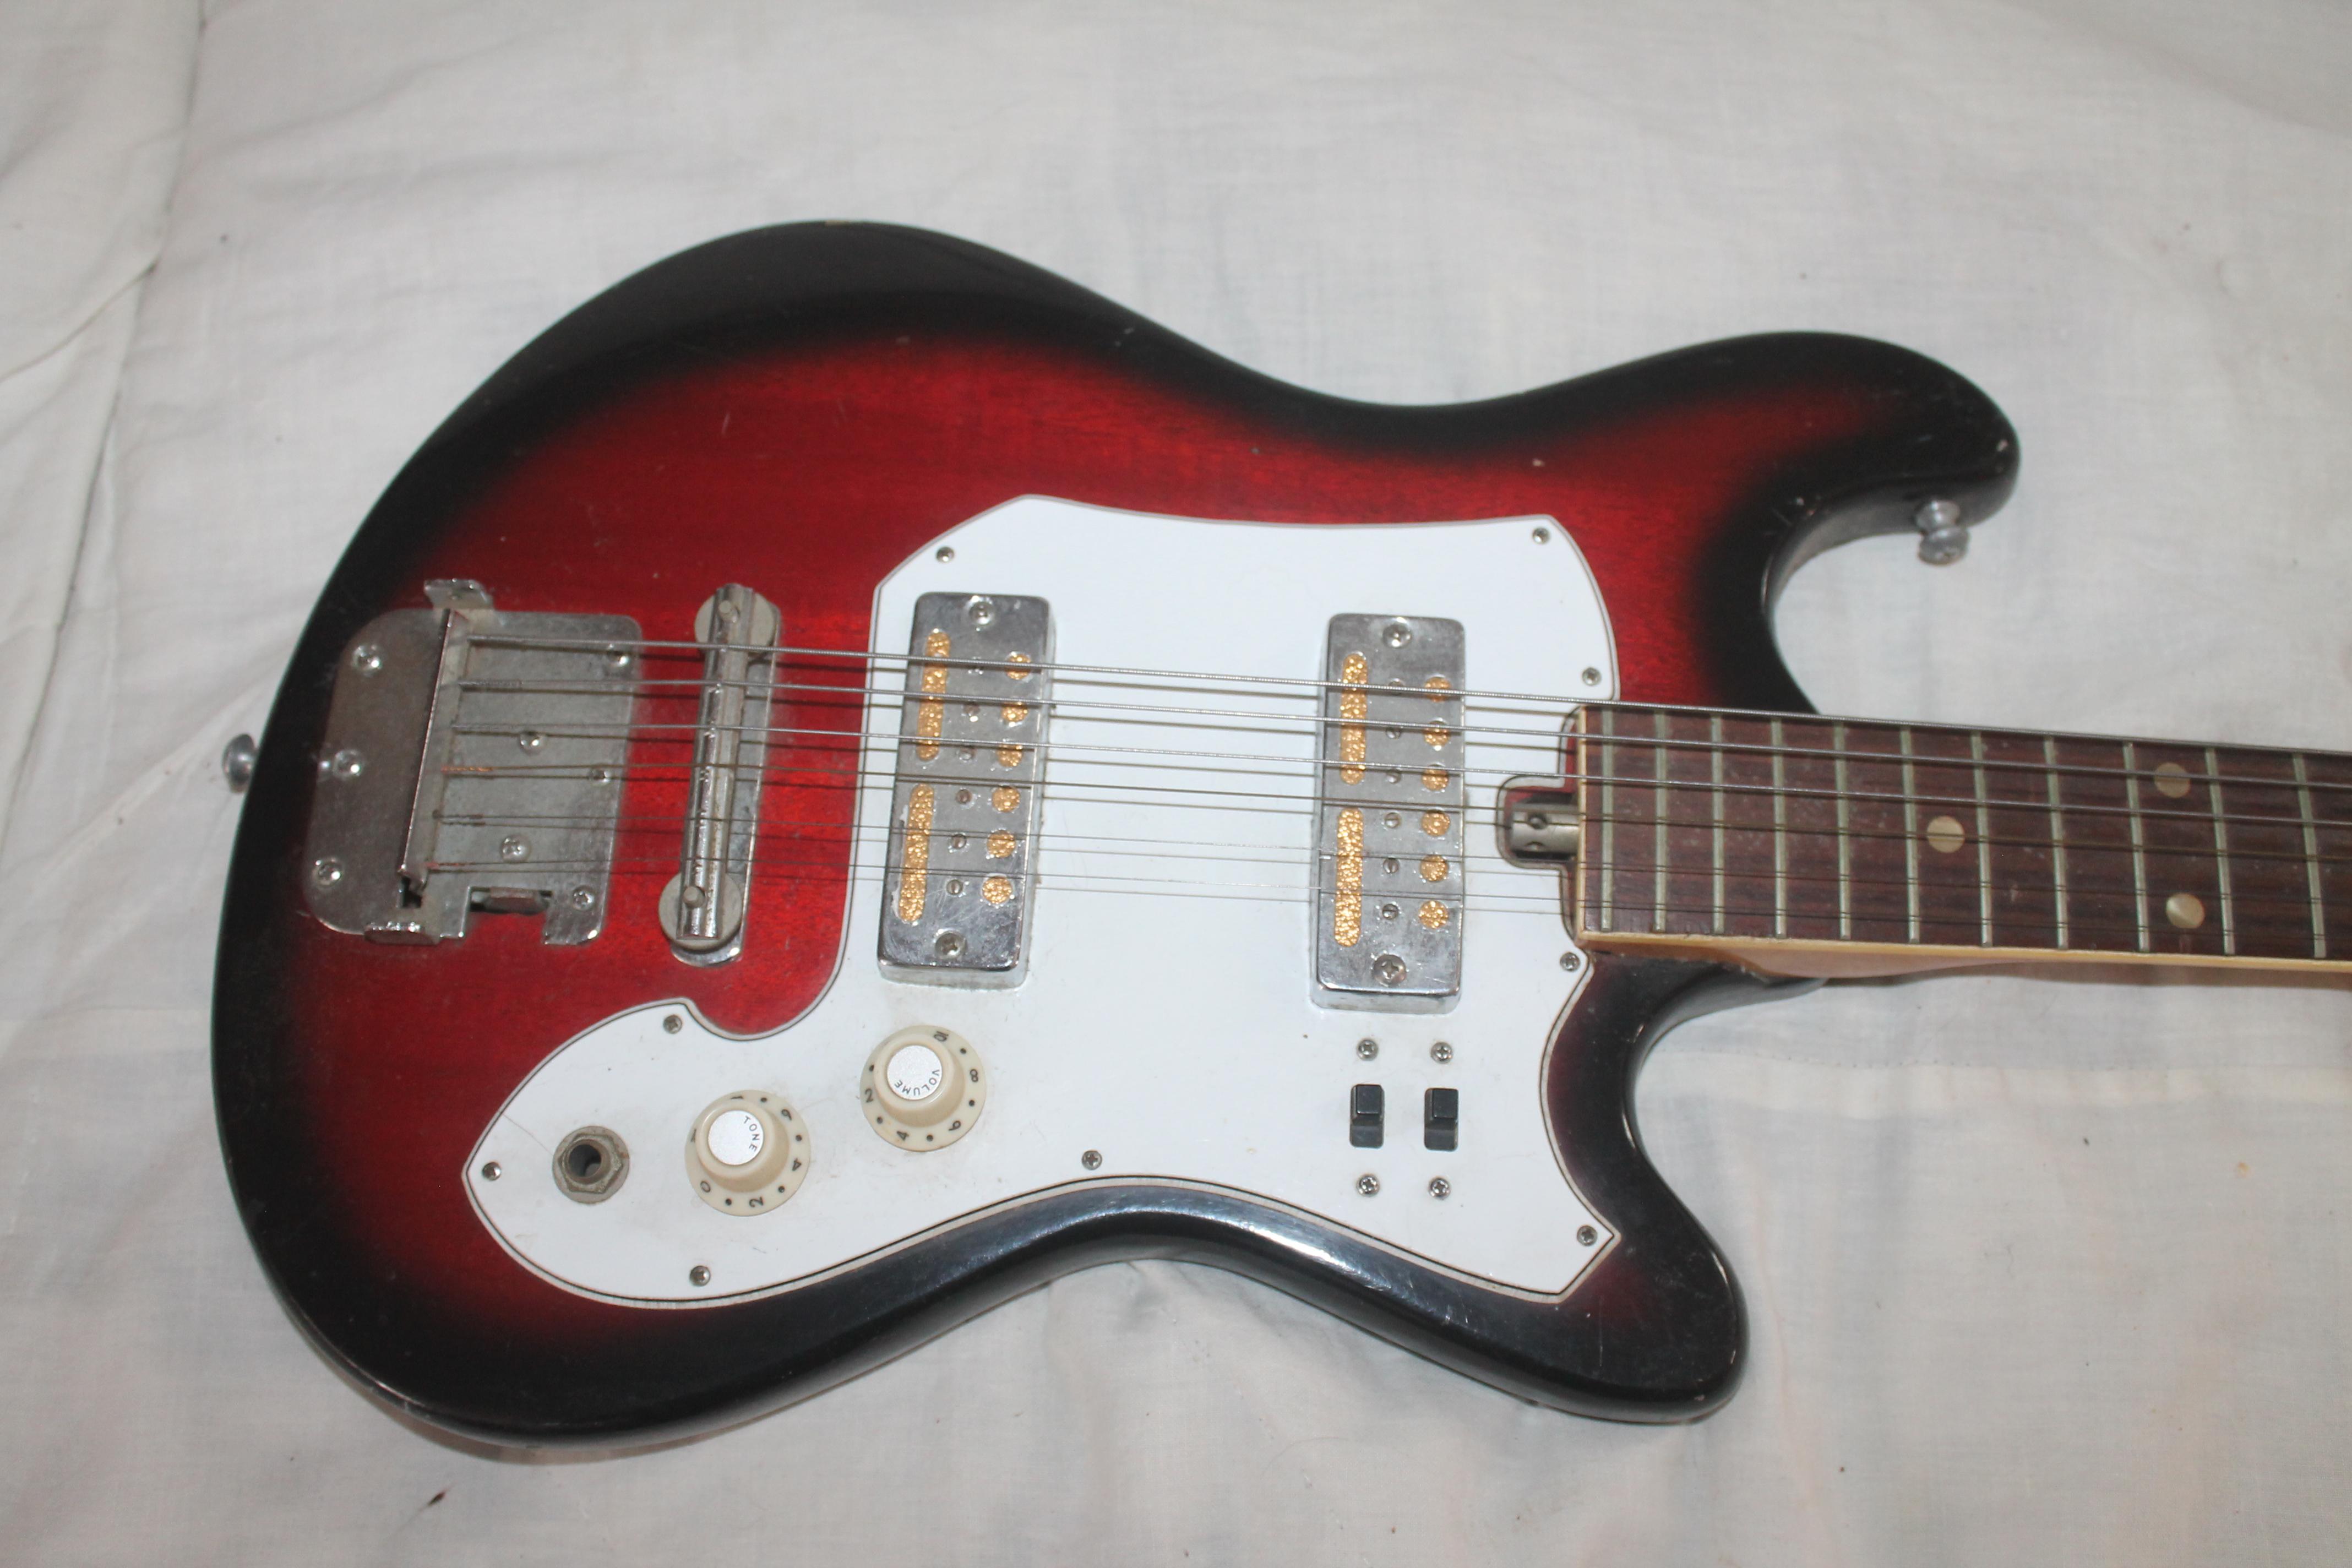 Vintage 1960's Sears Type Electric Guitar For Sale - Prestige